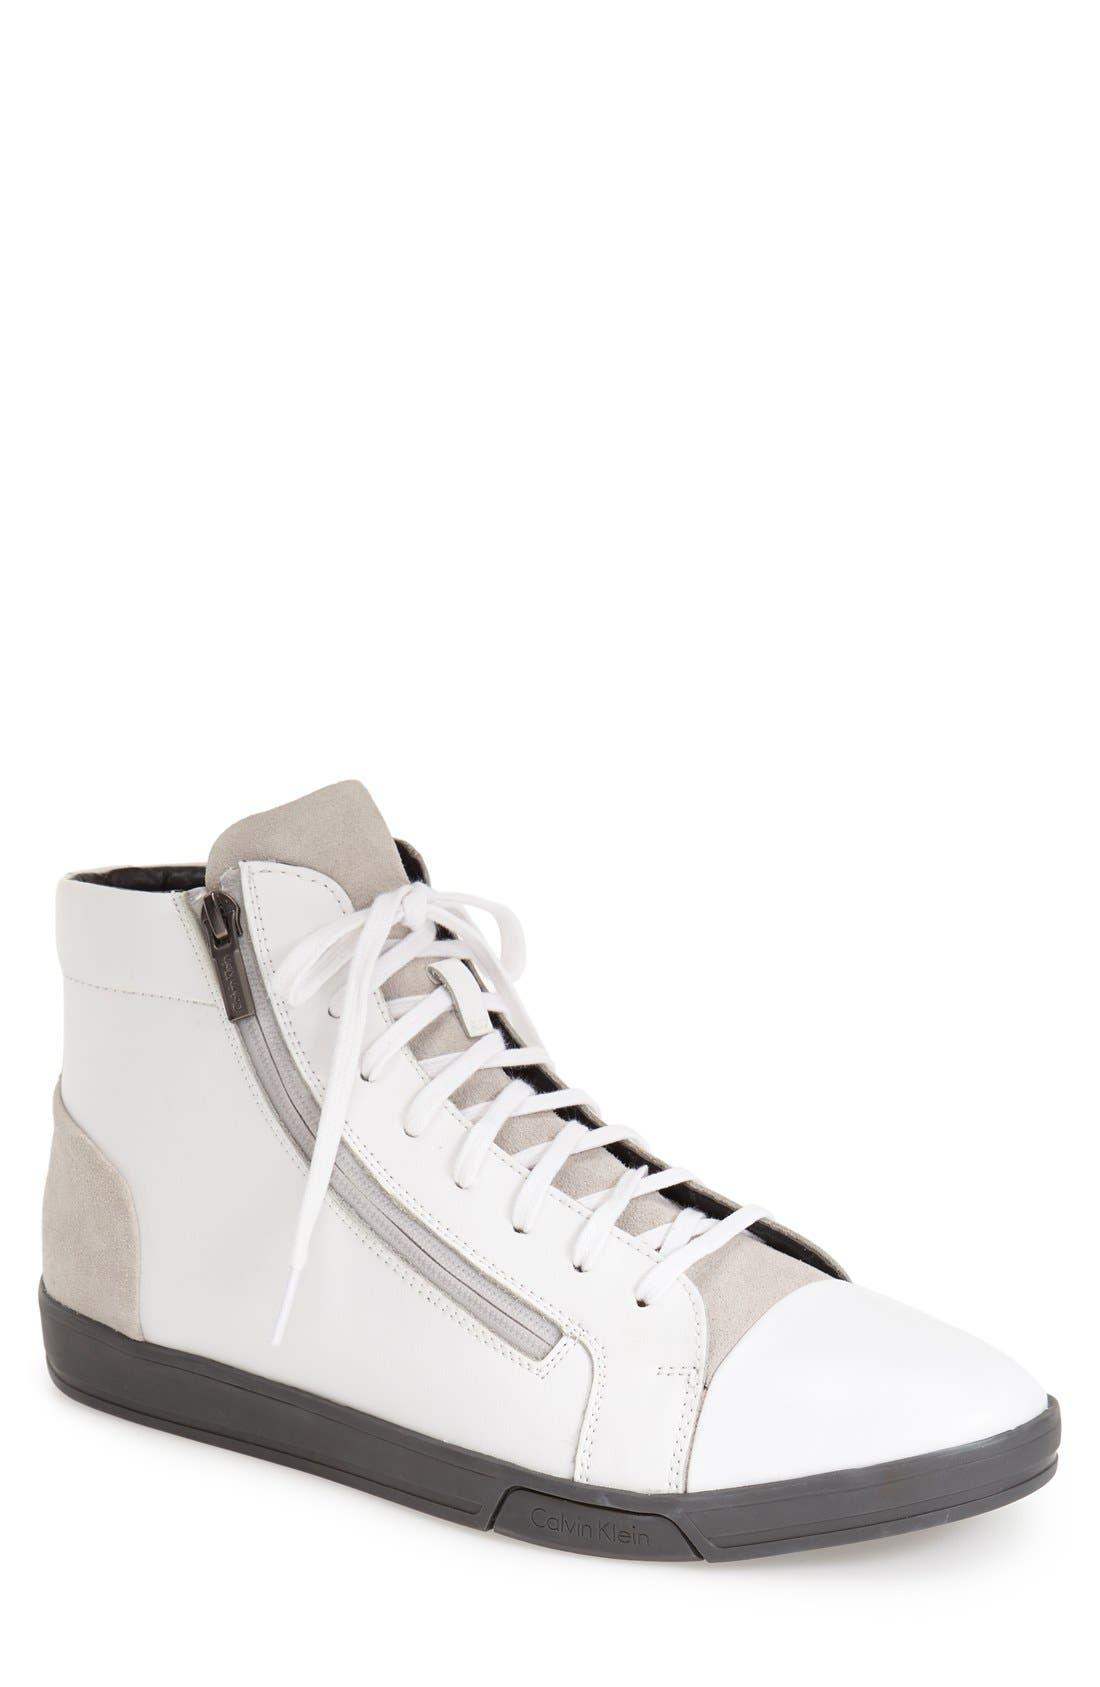 Main Image - Calvin Klein 'BerkeAction' Sneaker (Men)